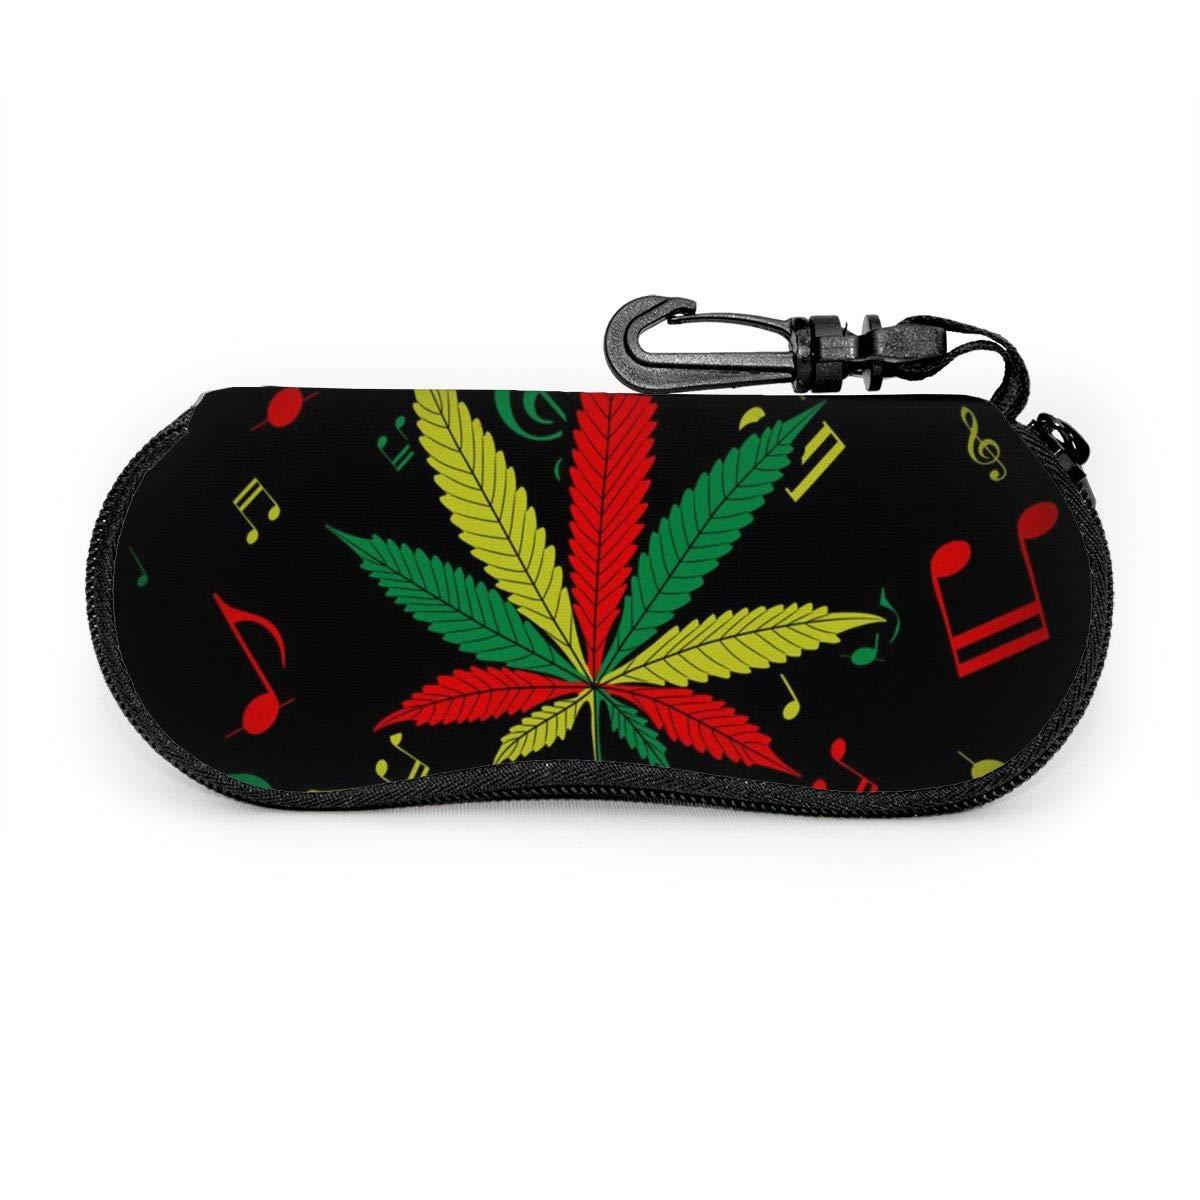 Colorful Music Marijuana Portable Travel Sunglasses Cases Ultra Light Neoprene Zipper Glasses Case With Carabiner